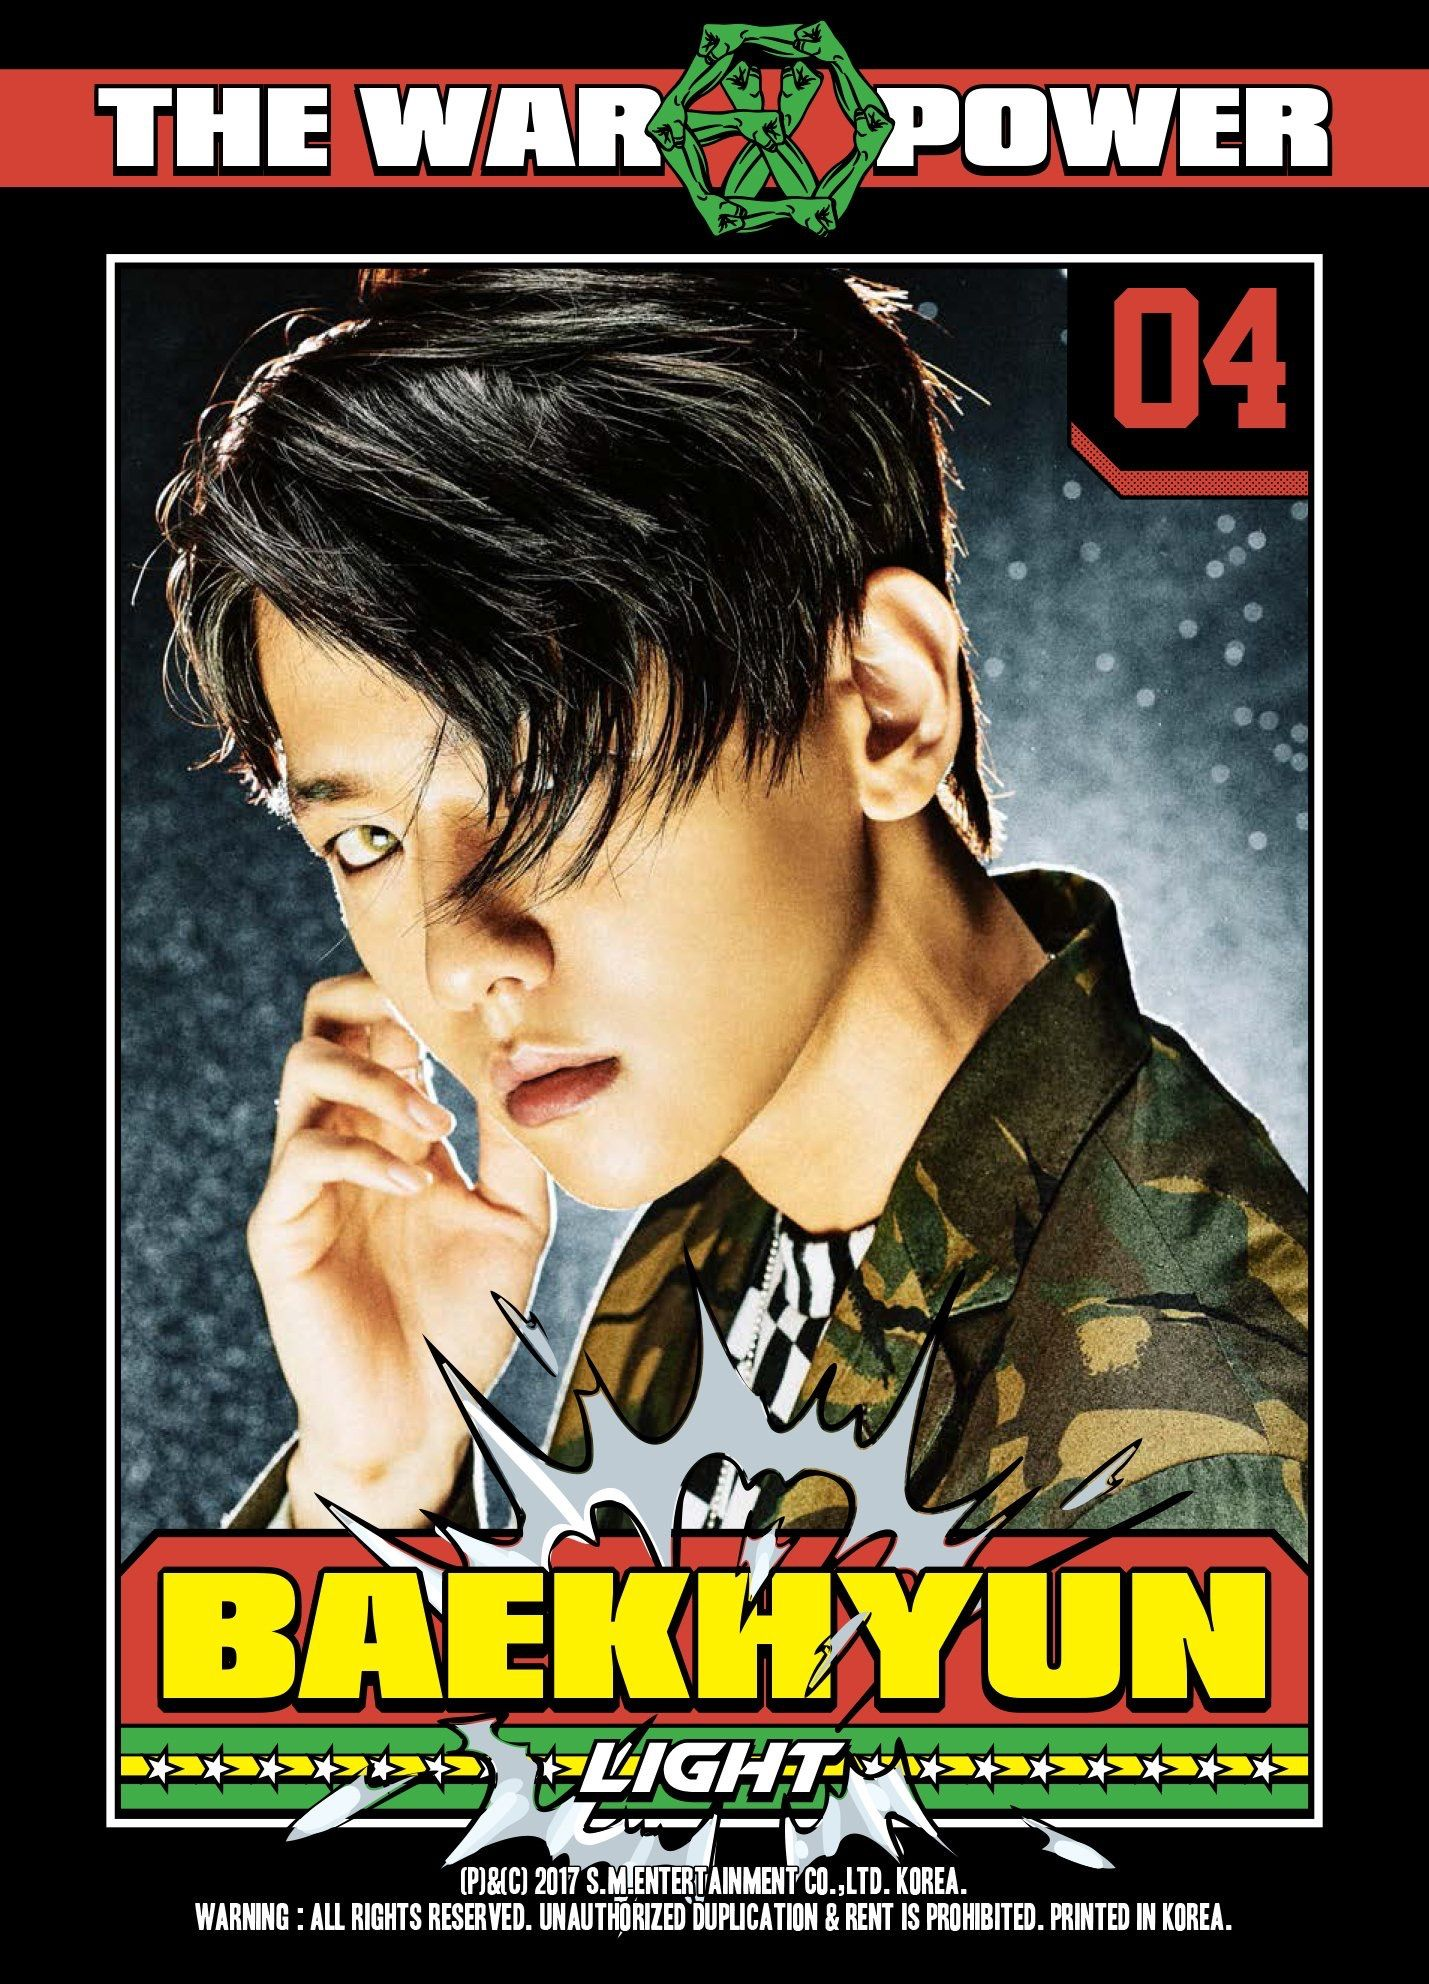 EXO POWER Baekhyun Артист, Рисунок, Южная корея